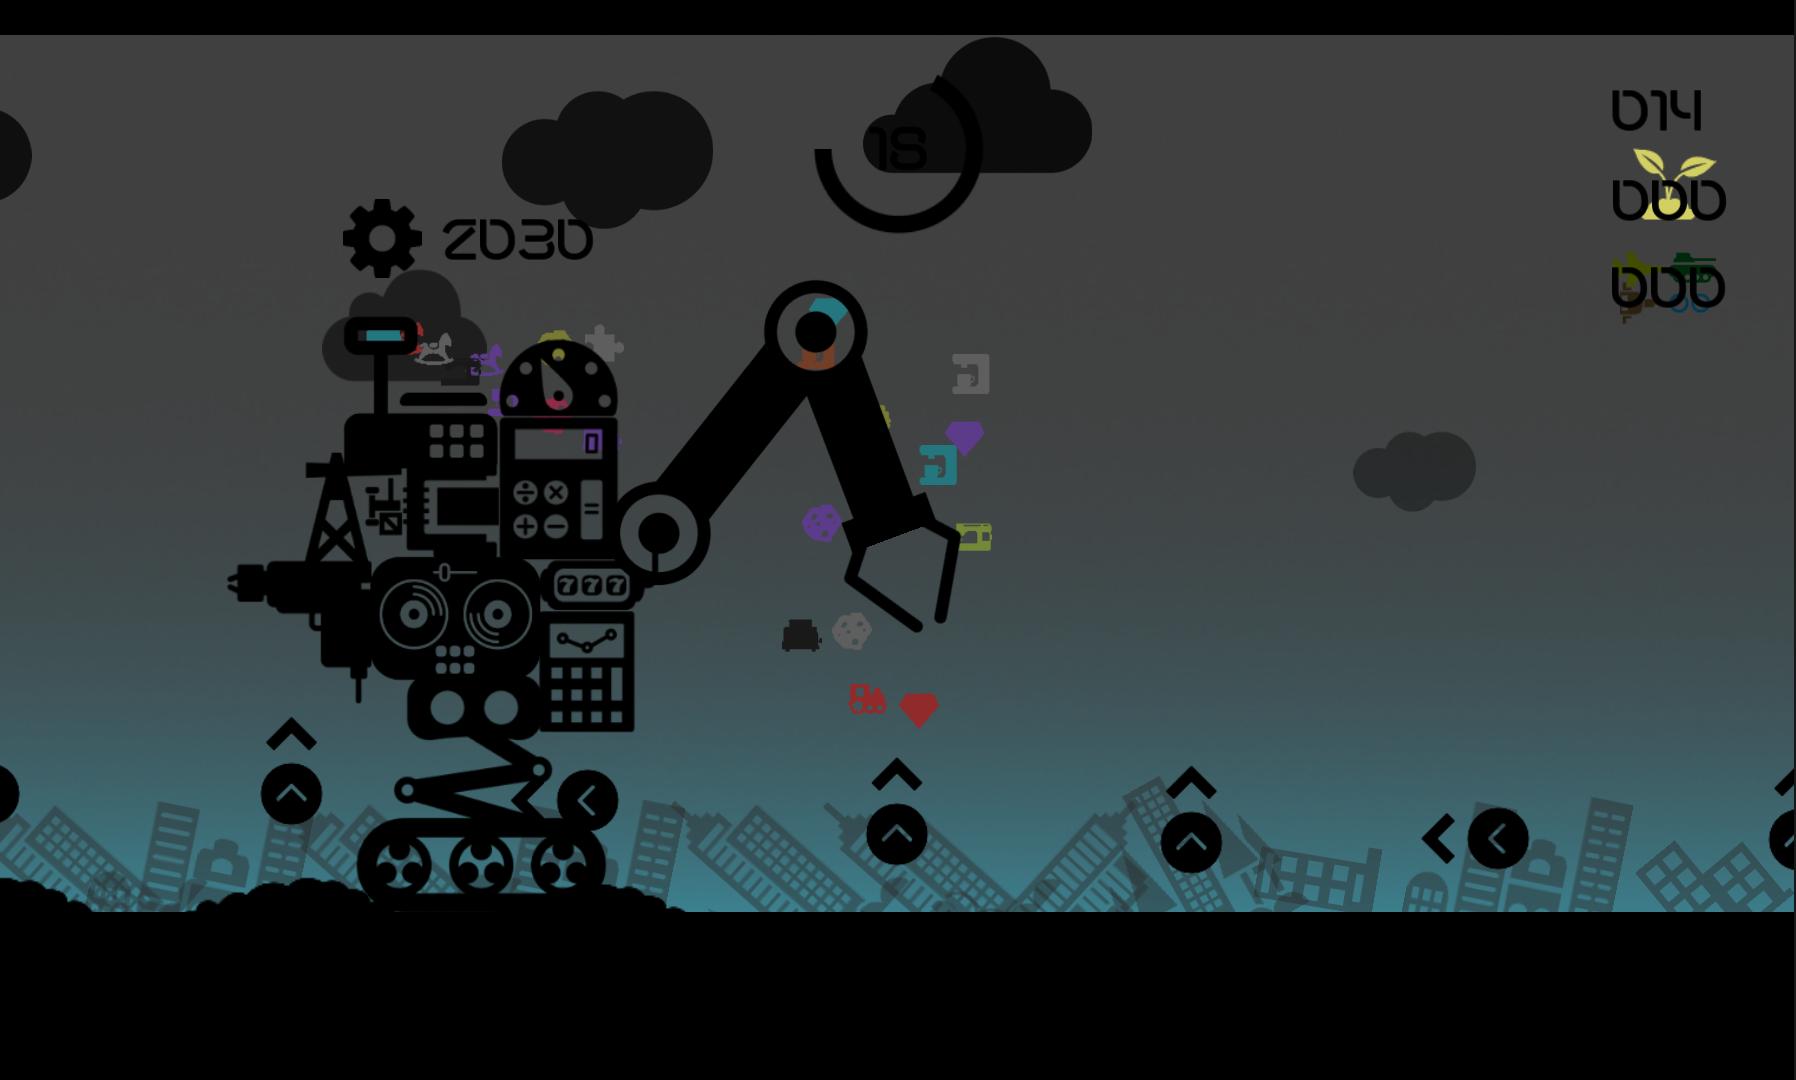 androidアプリ ひとたがやし攻略スクリーンショット2